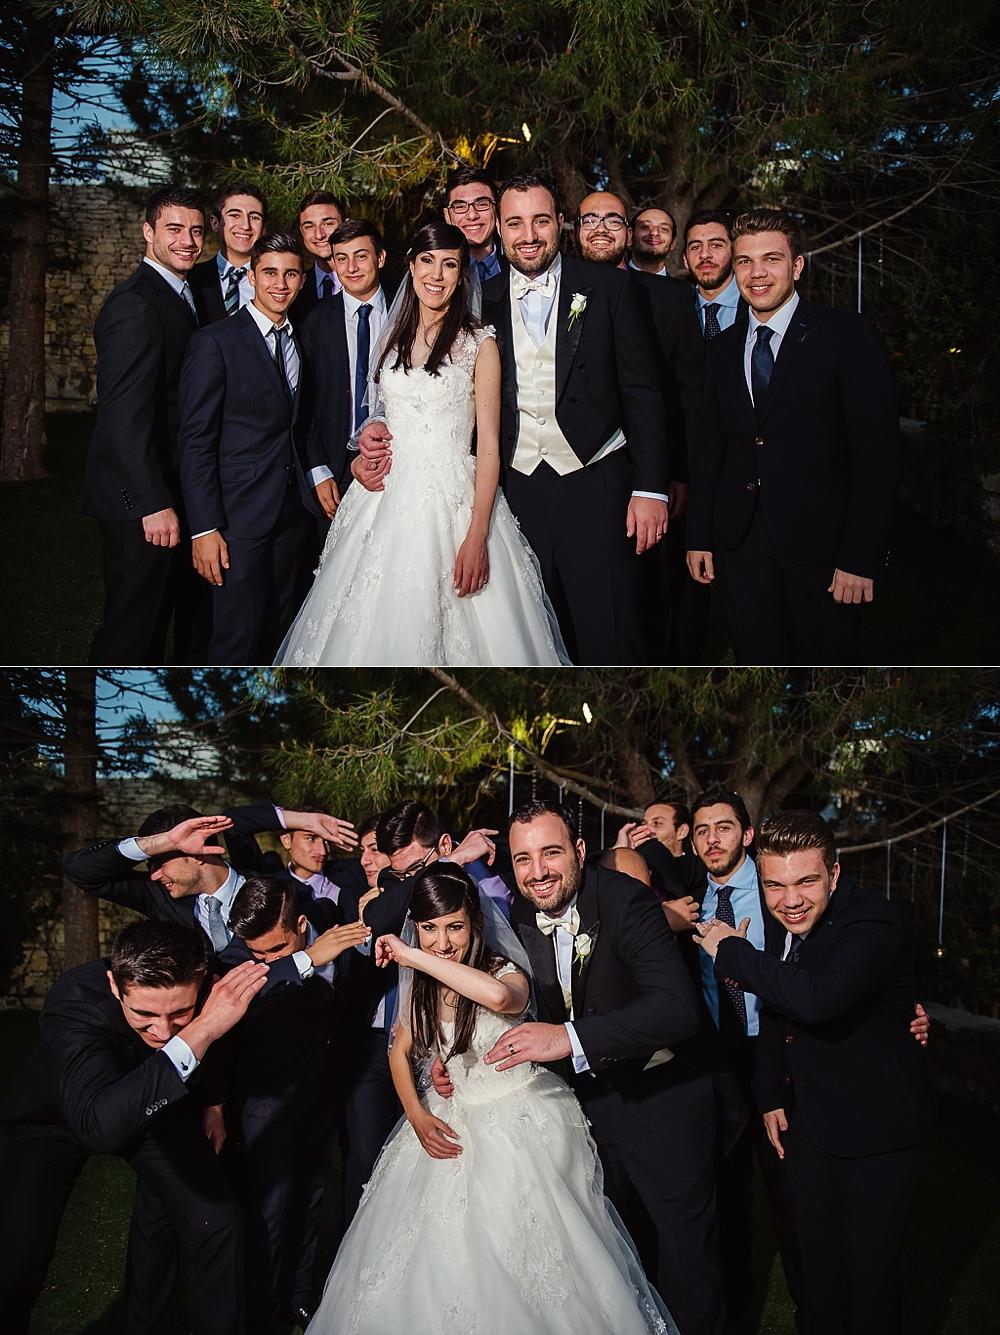 Kristina & Thomas - Villa Arrigo - Wedding Photography Malta - Shane P. Watts